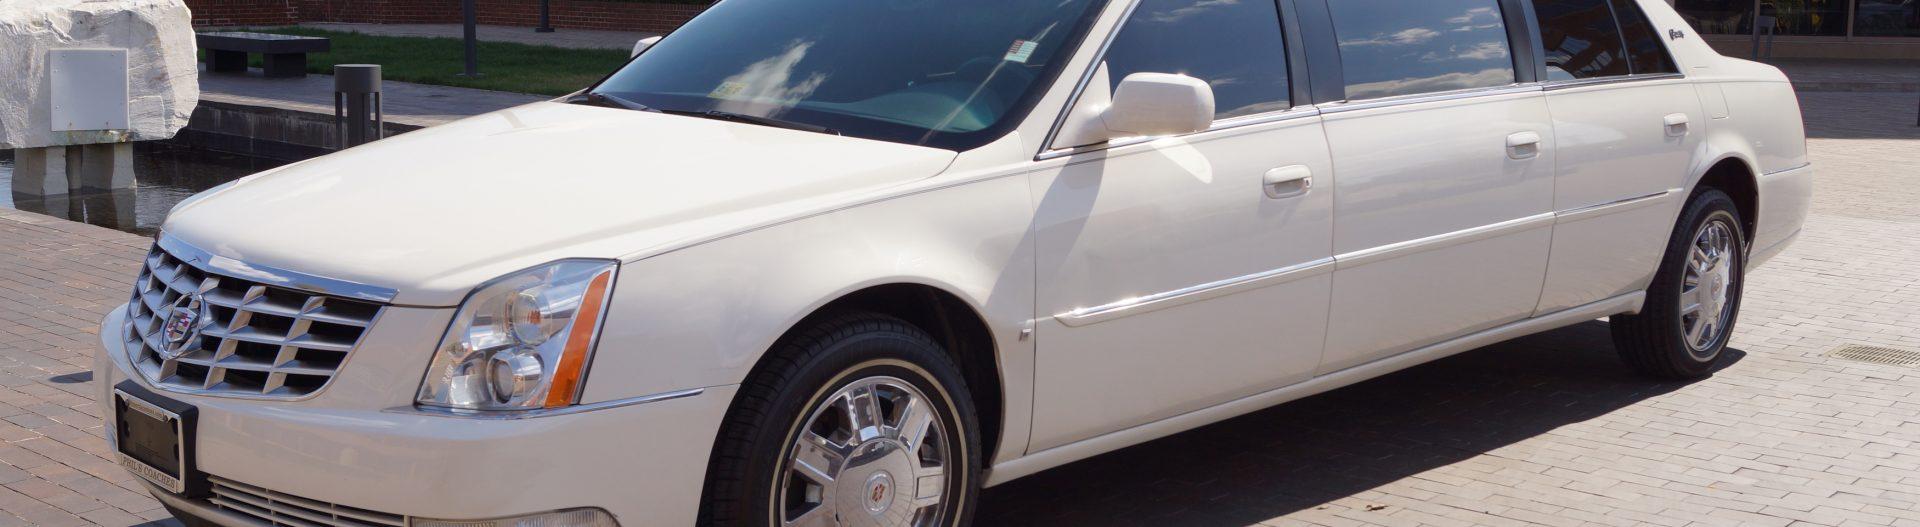 2008 Cadillac Ambassador